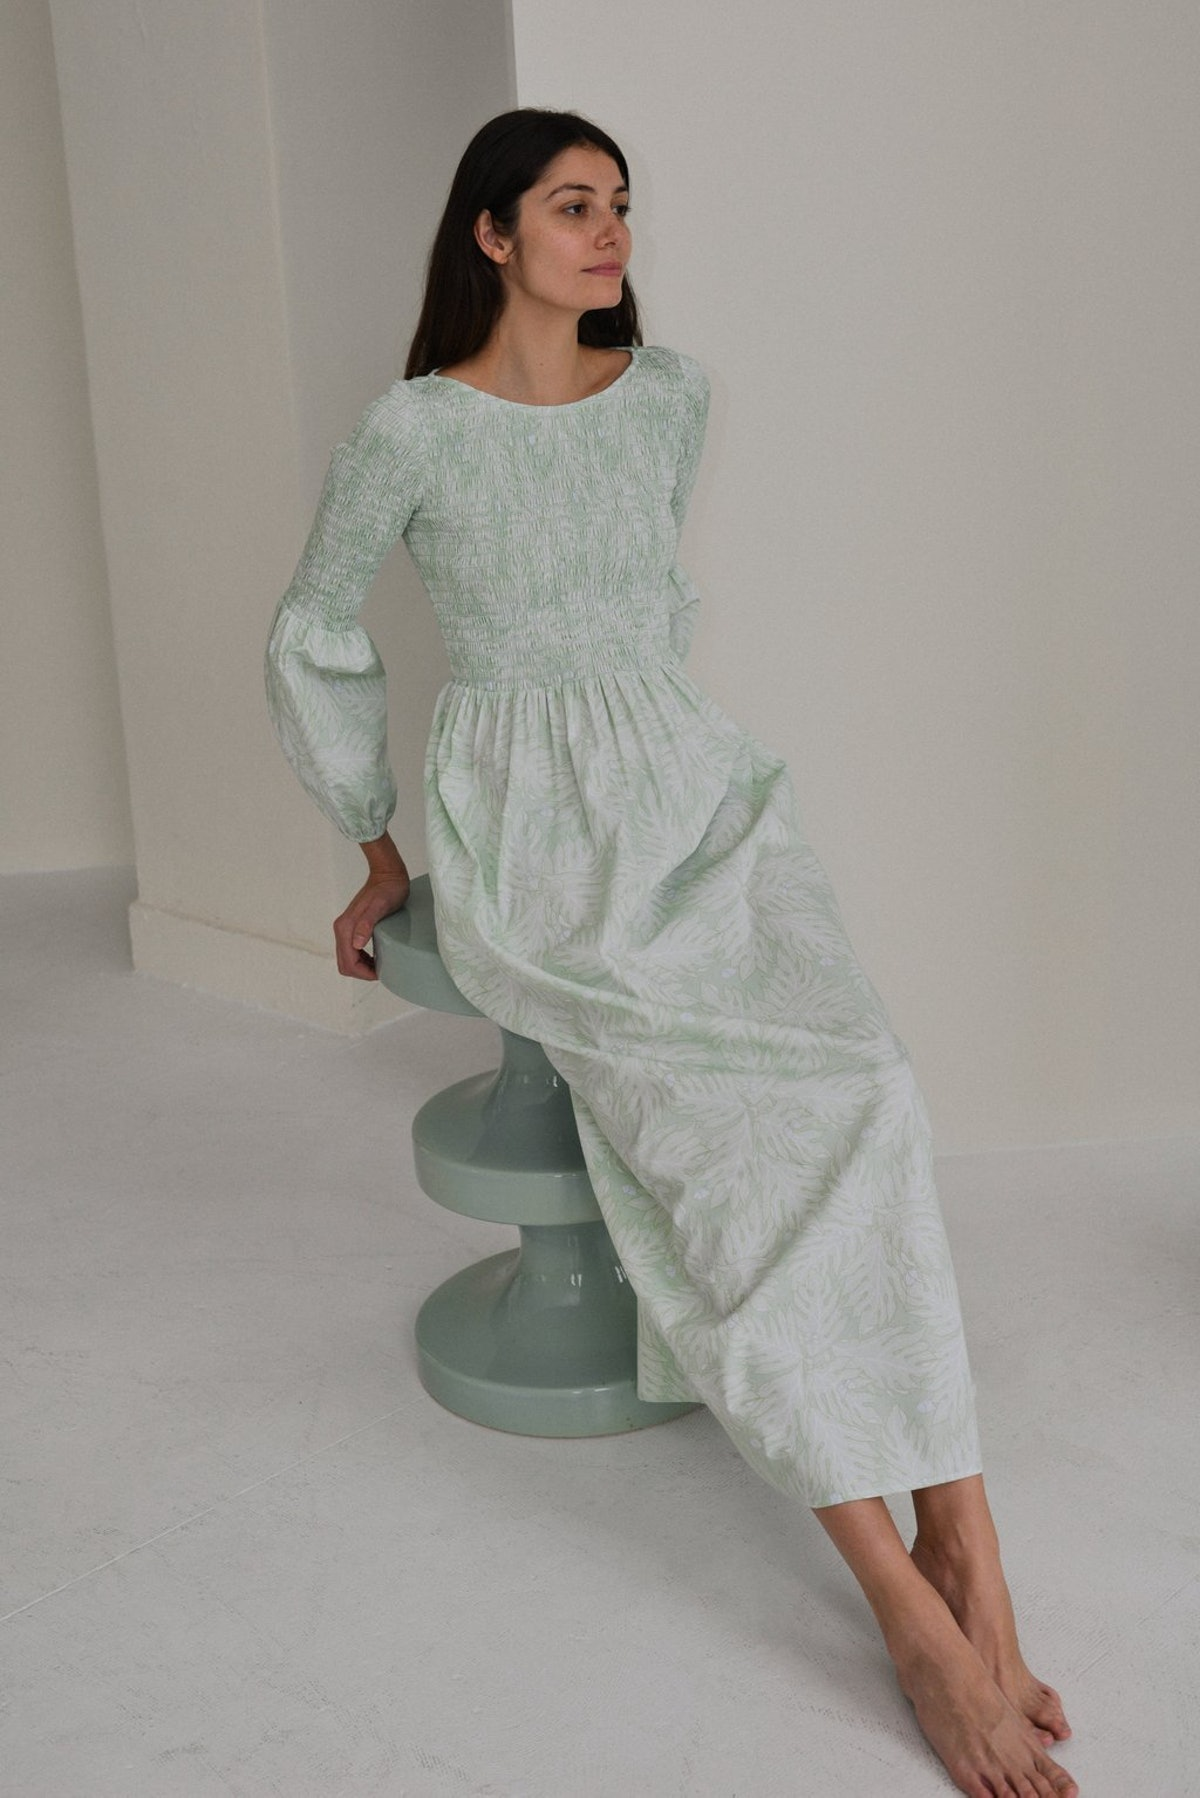 Smocked Maxi Dress in Green Breadfruit